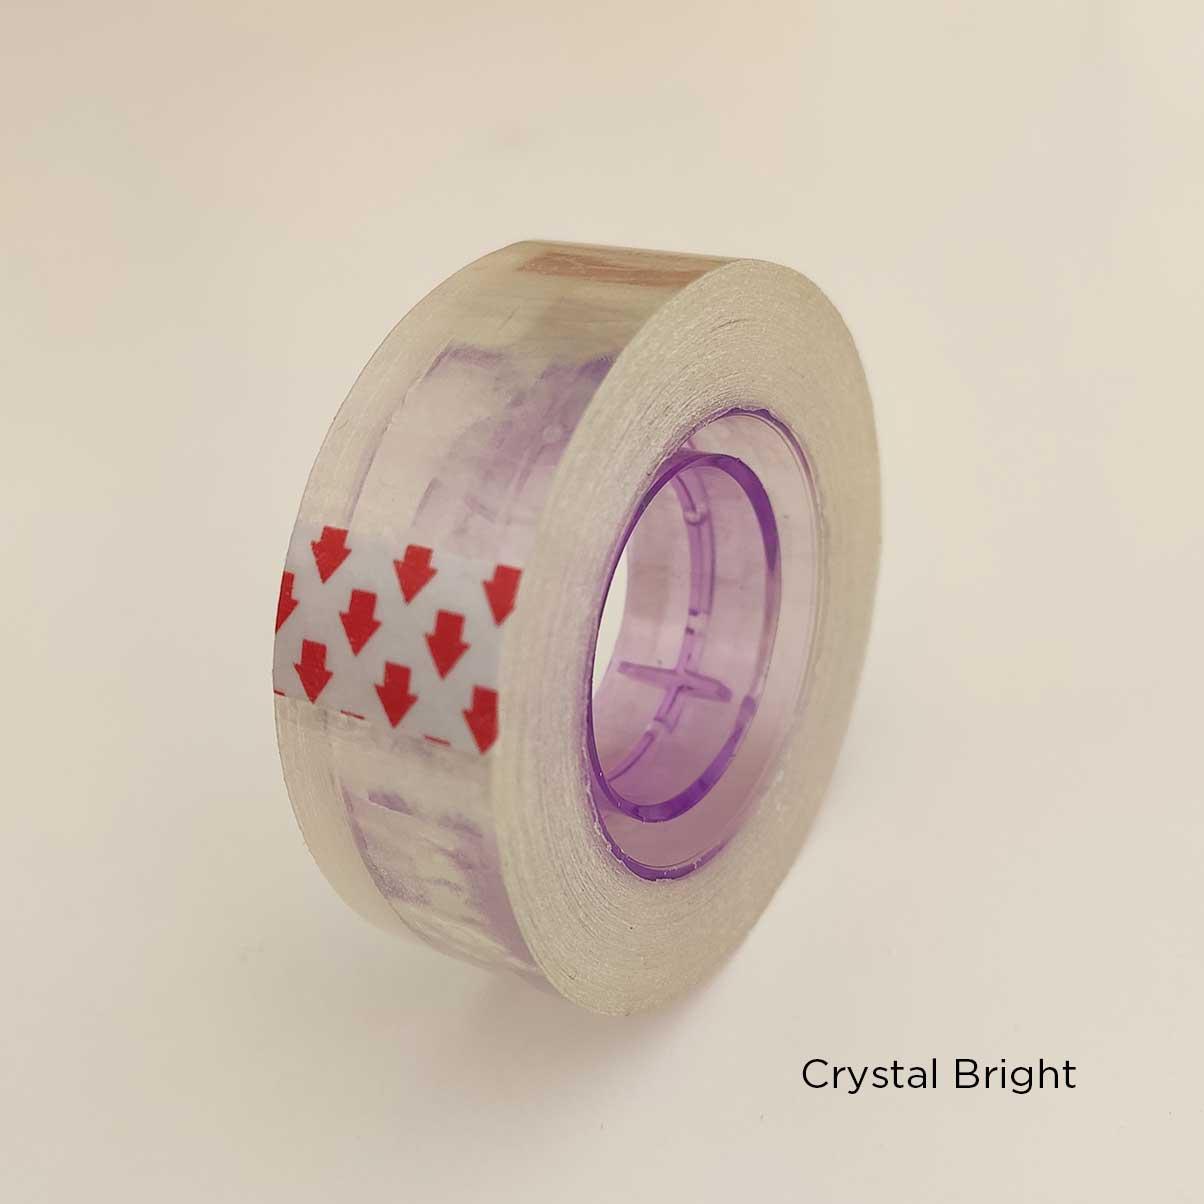 GYMO SPORTS - Gymo Çember Kaplama Kristal Bant